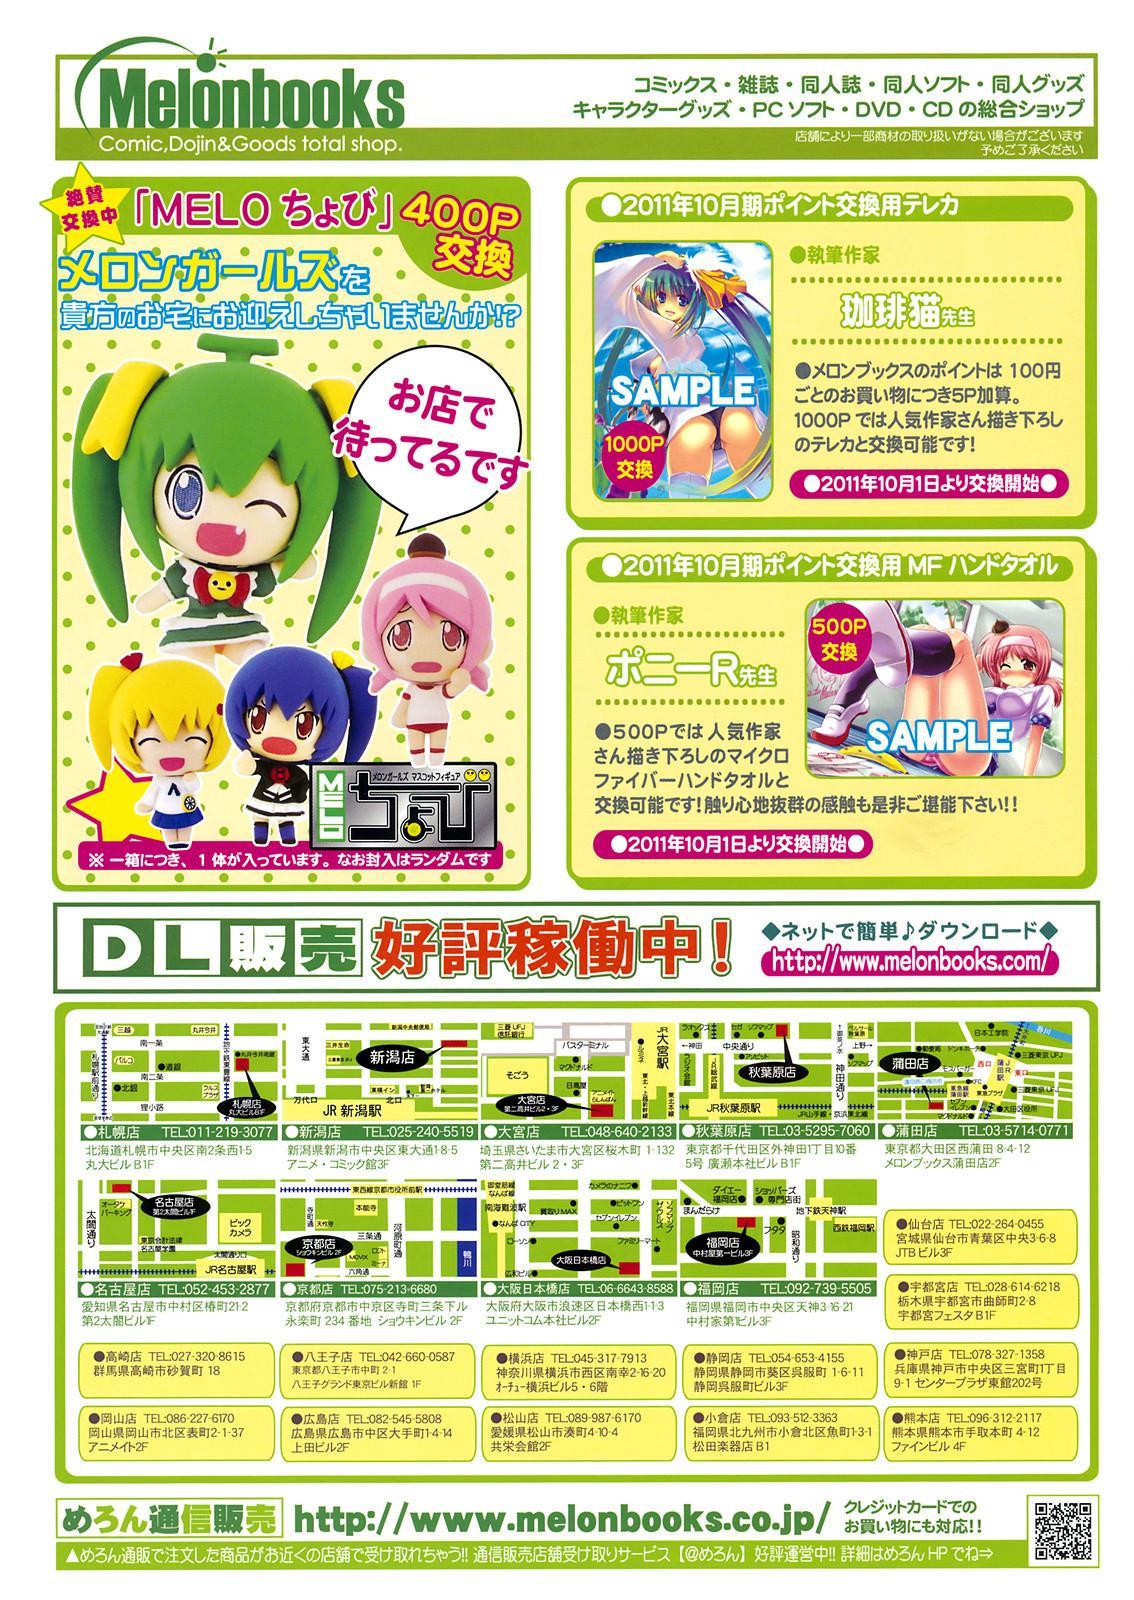 COMIC LO 2011-12 Vol. 93 1